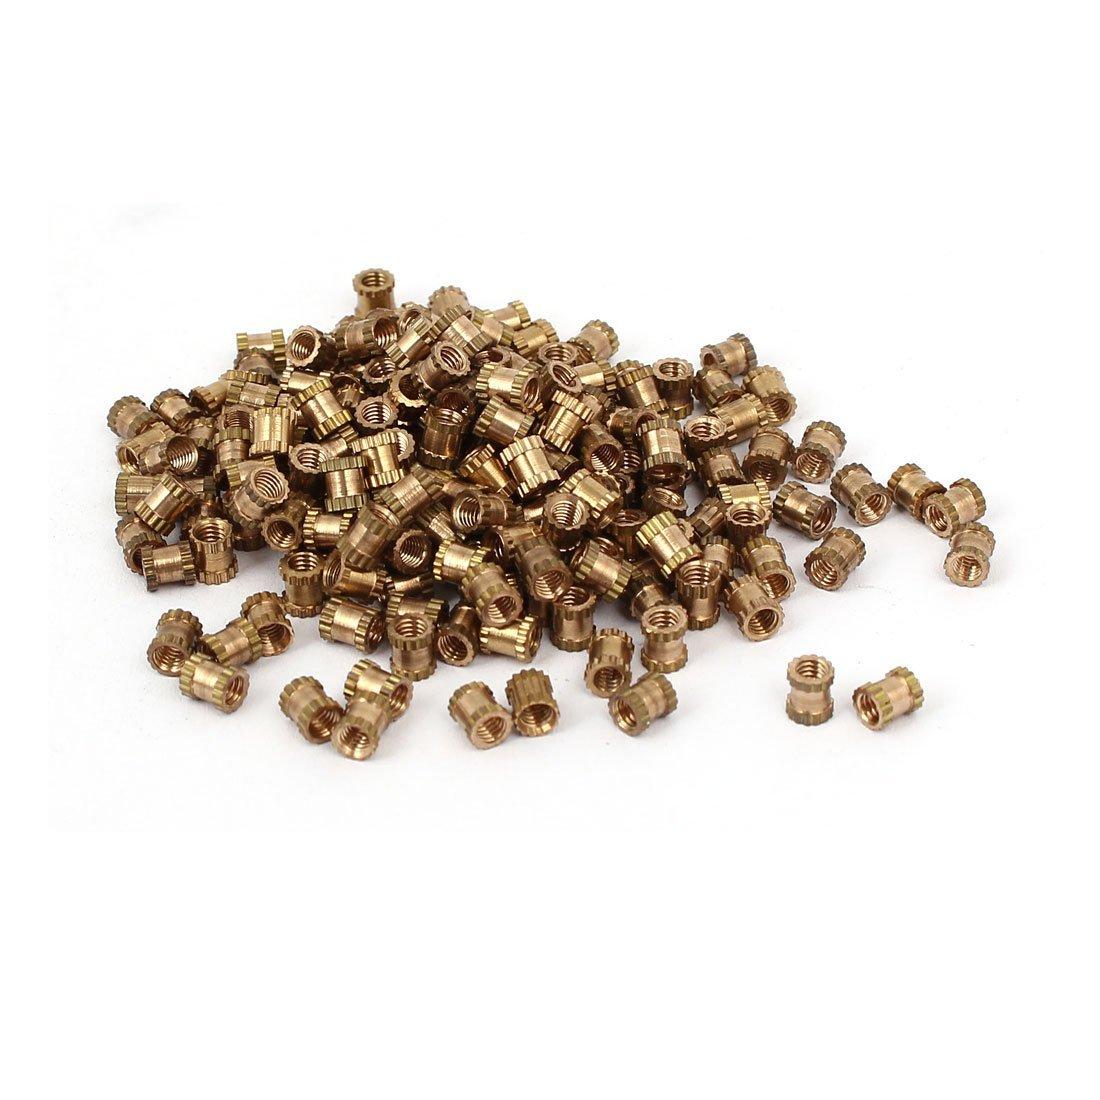 M2.5 x 4 mm 3.5 mm OD Brass Threaded Insert recessed knurled nut 200 Pieces